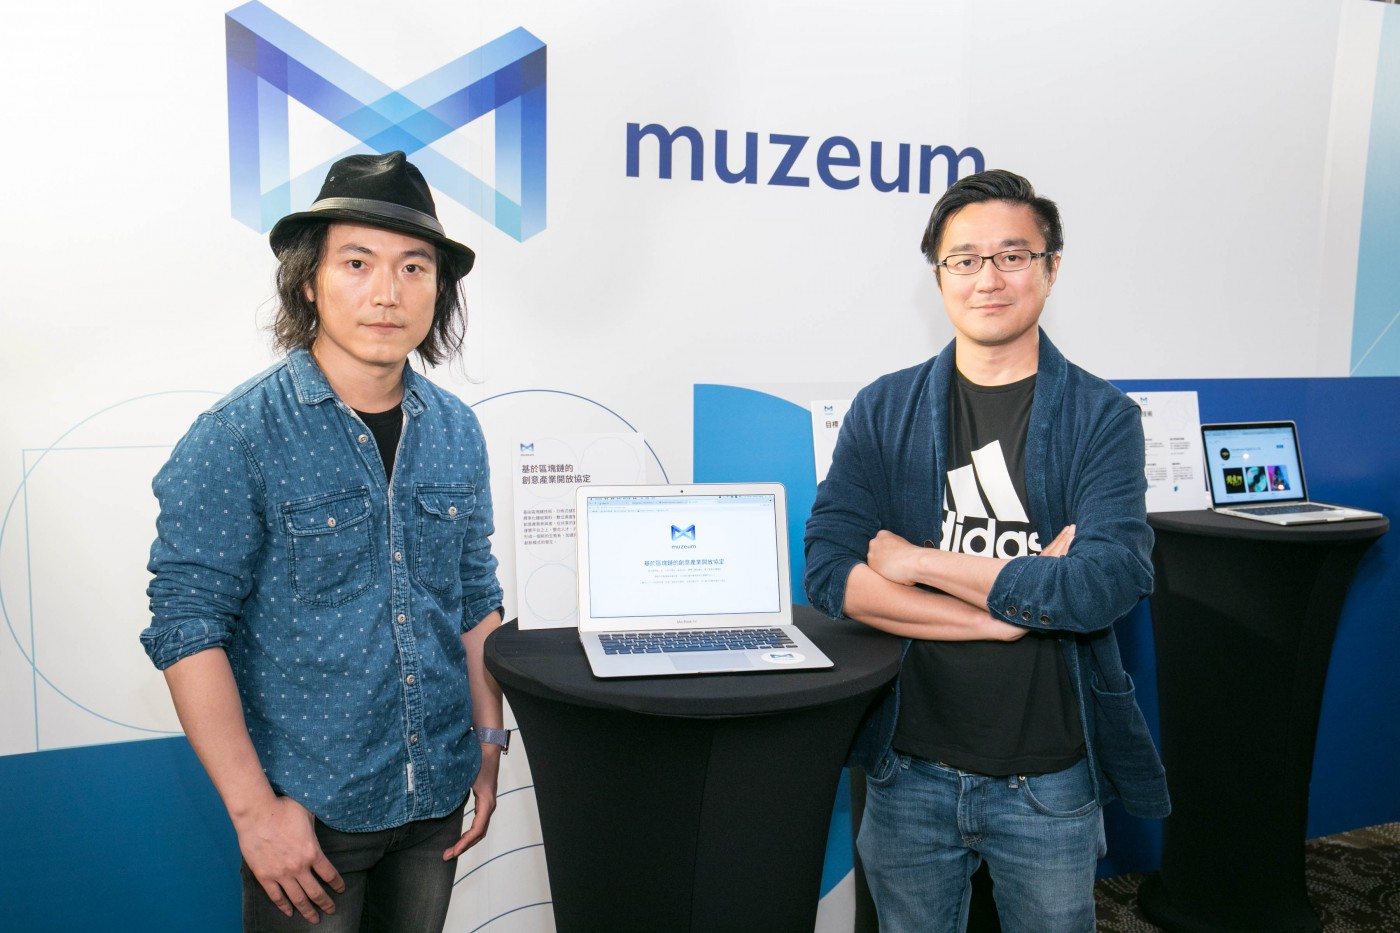 KKFARM解決台灣文創產業痛點,首創「Muzeum」區塊鏈簡化授權流程